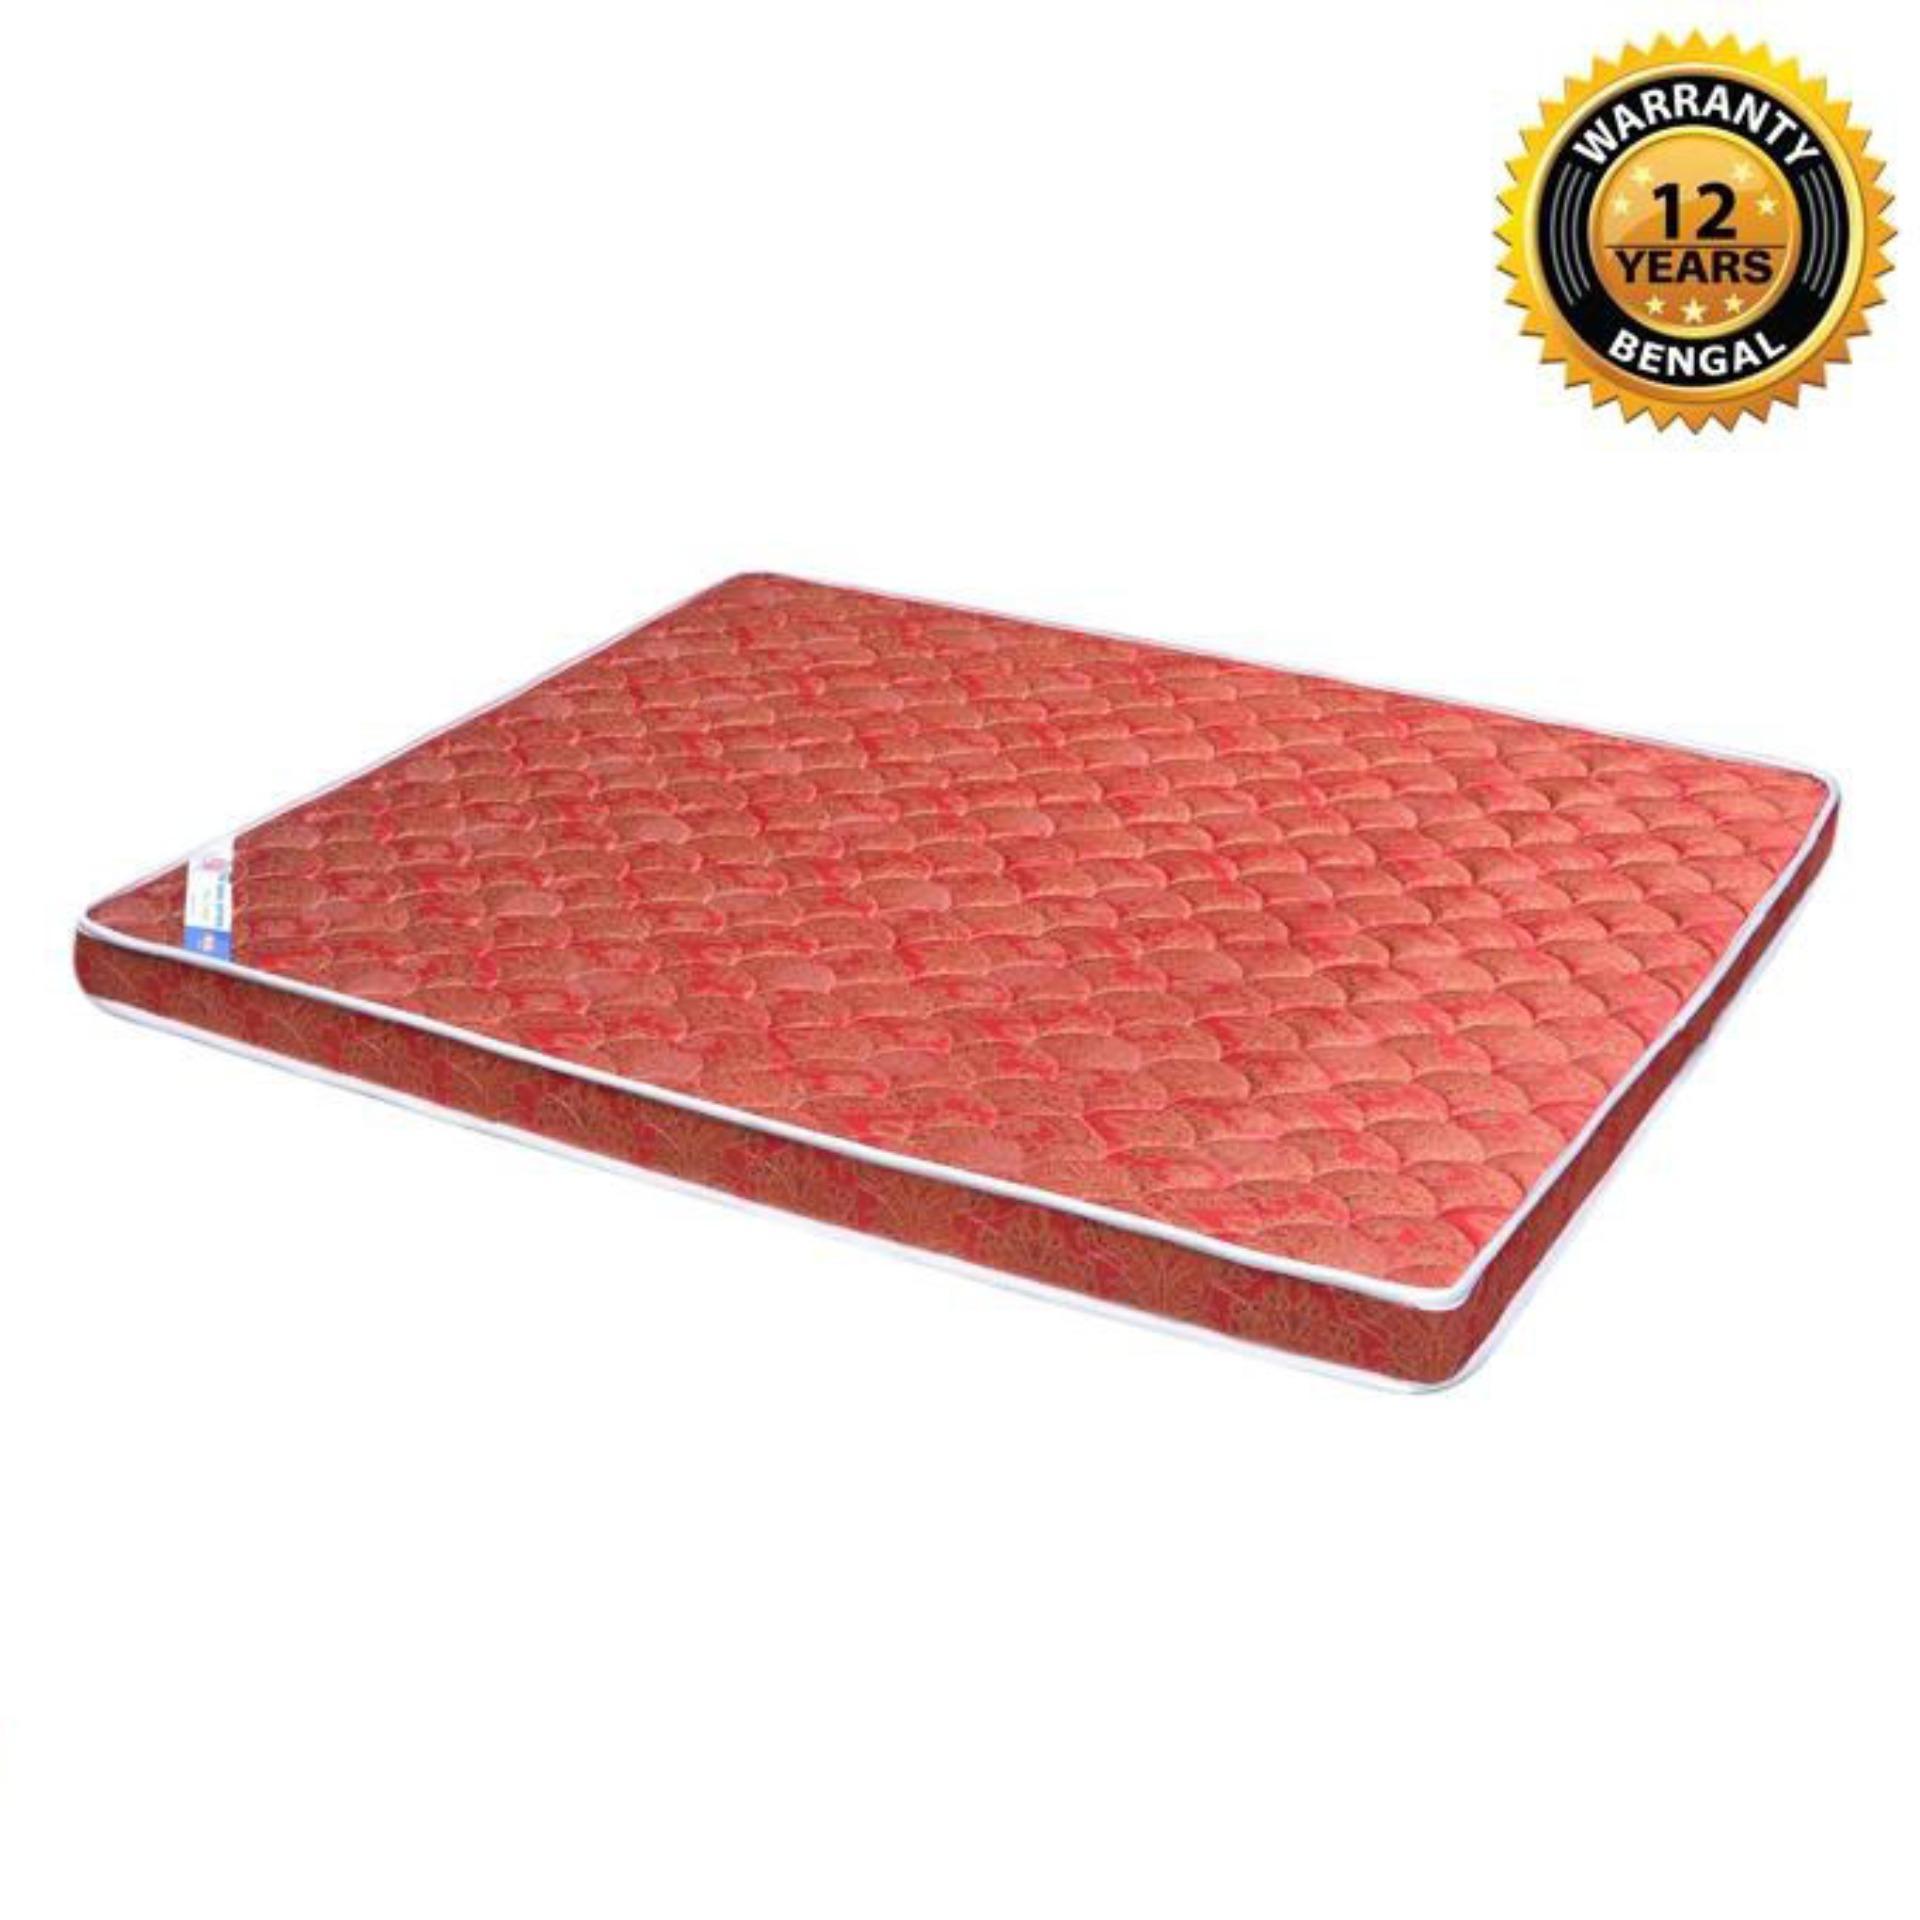 "Bengal Spring Mattress (78""x48""x8"") - Red"